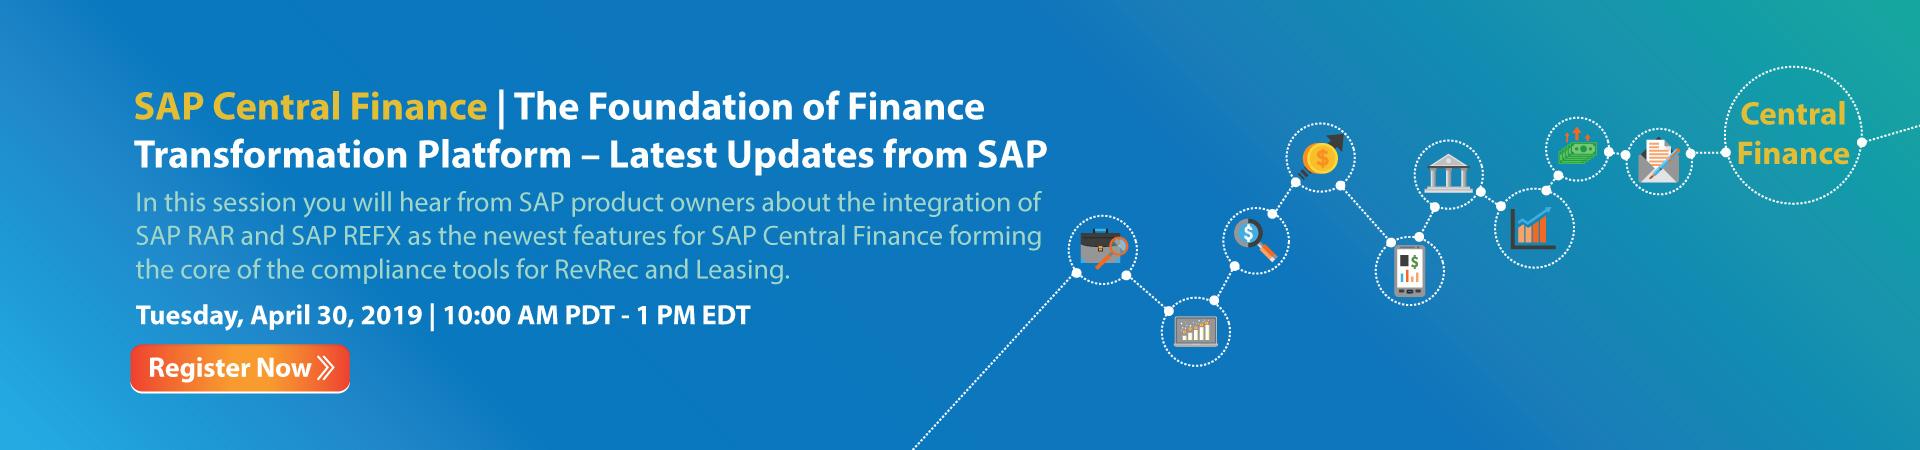 SAP Central Finance – The Foundation of Finance Transformation Platform